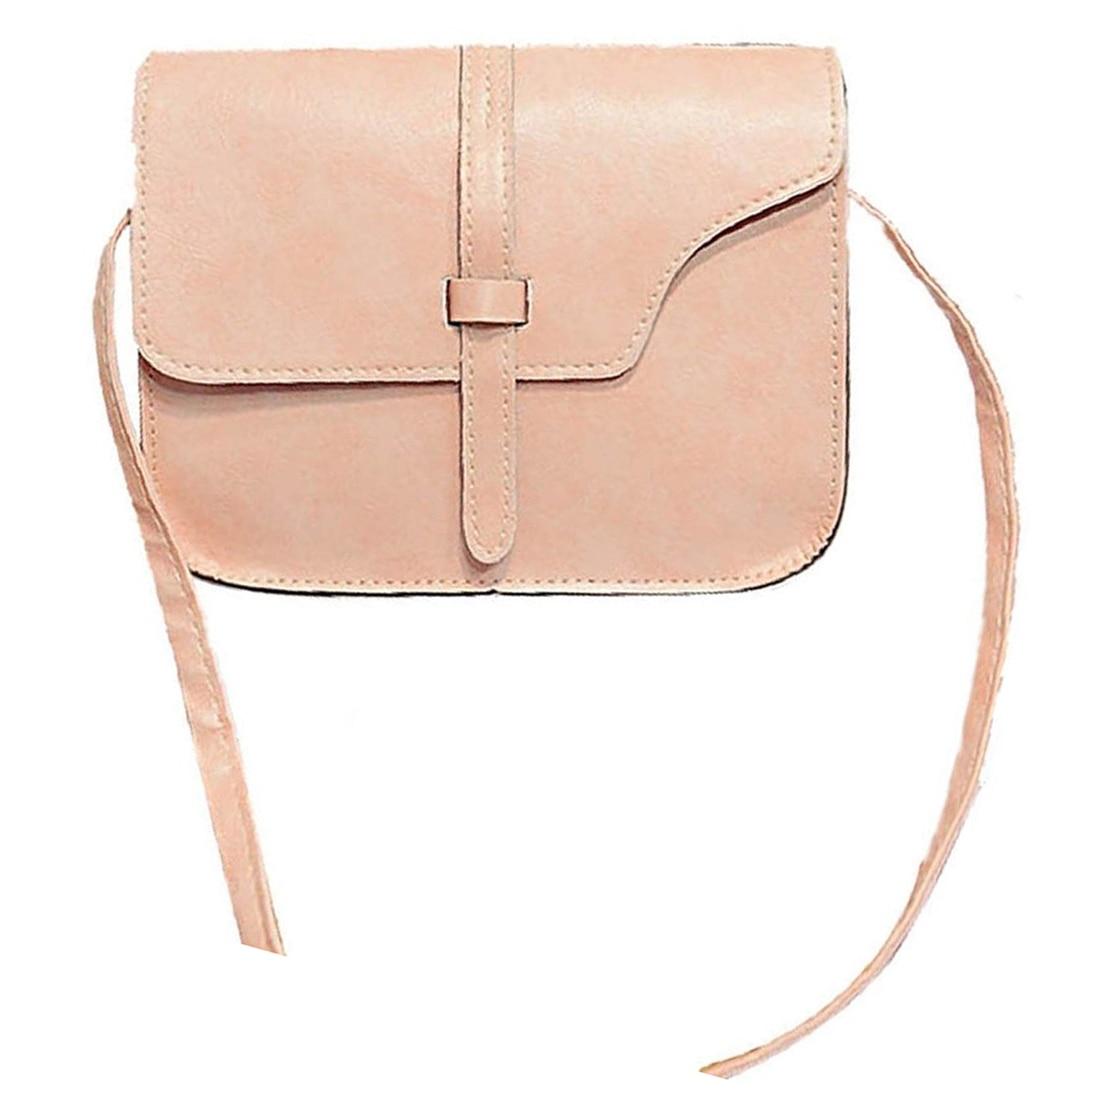 Women Girl Shoulder Bag Briefcase Faux Leather Crossbody Tote Bag pink